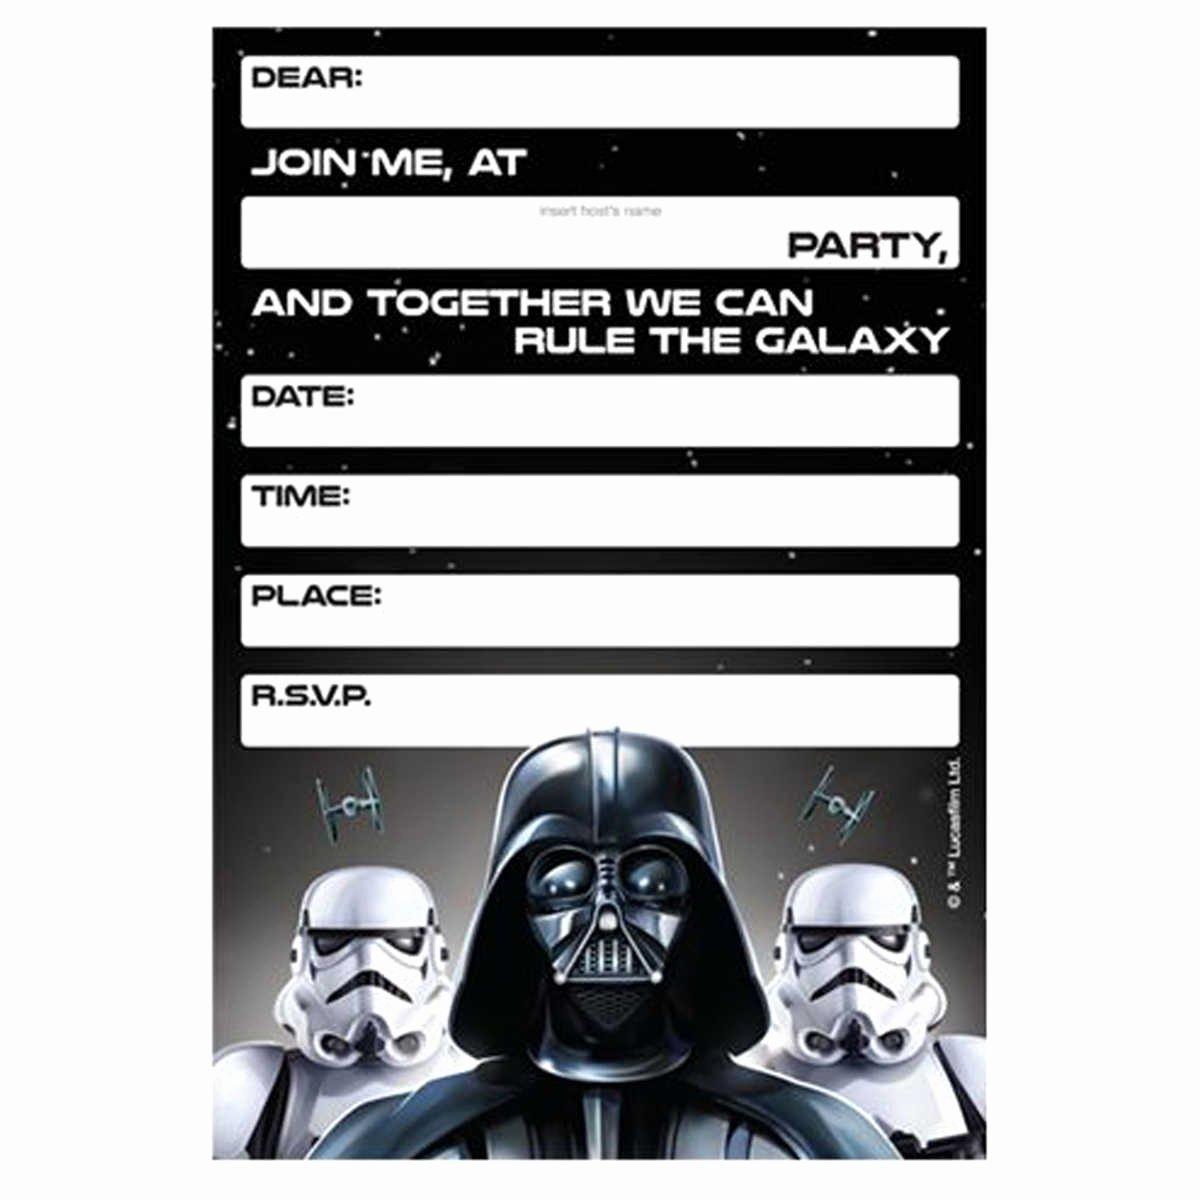 Lego Star Wars Birthday Invitations Template – Bagvania